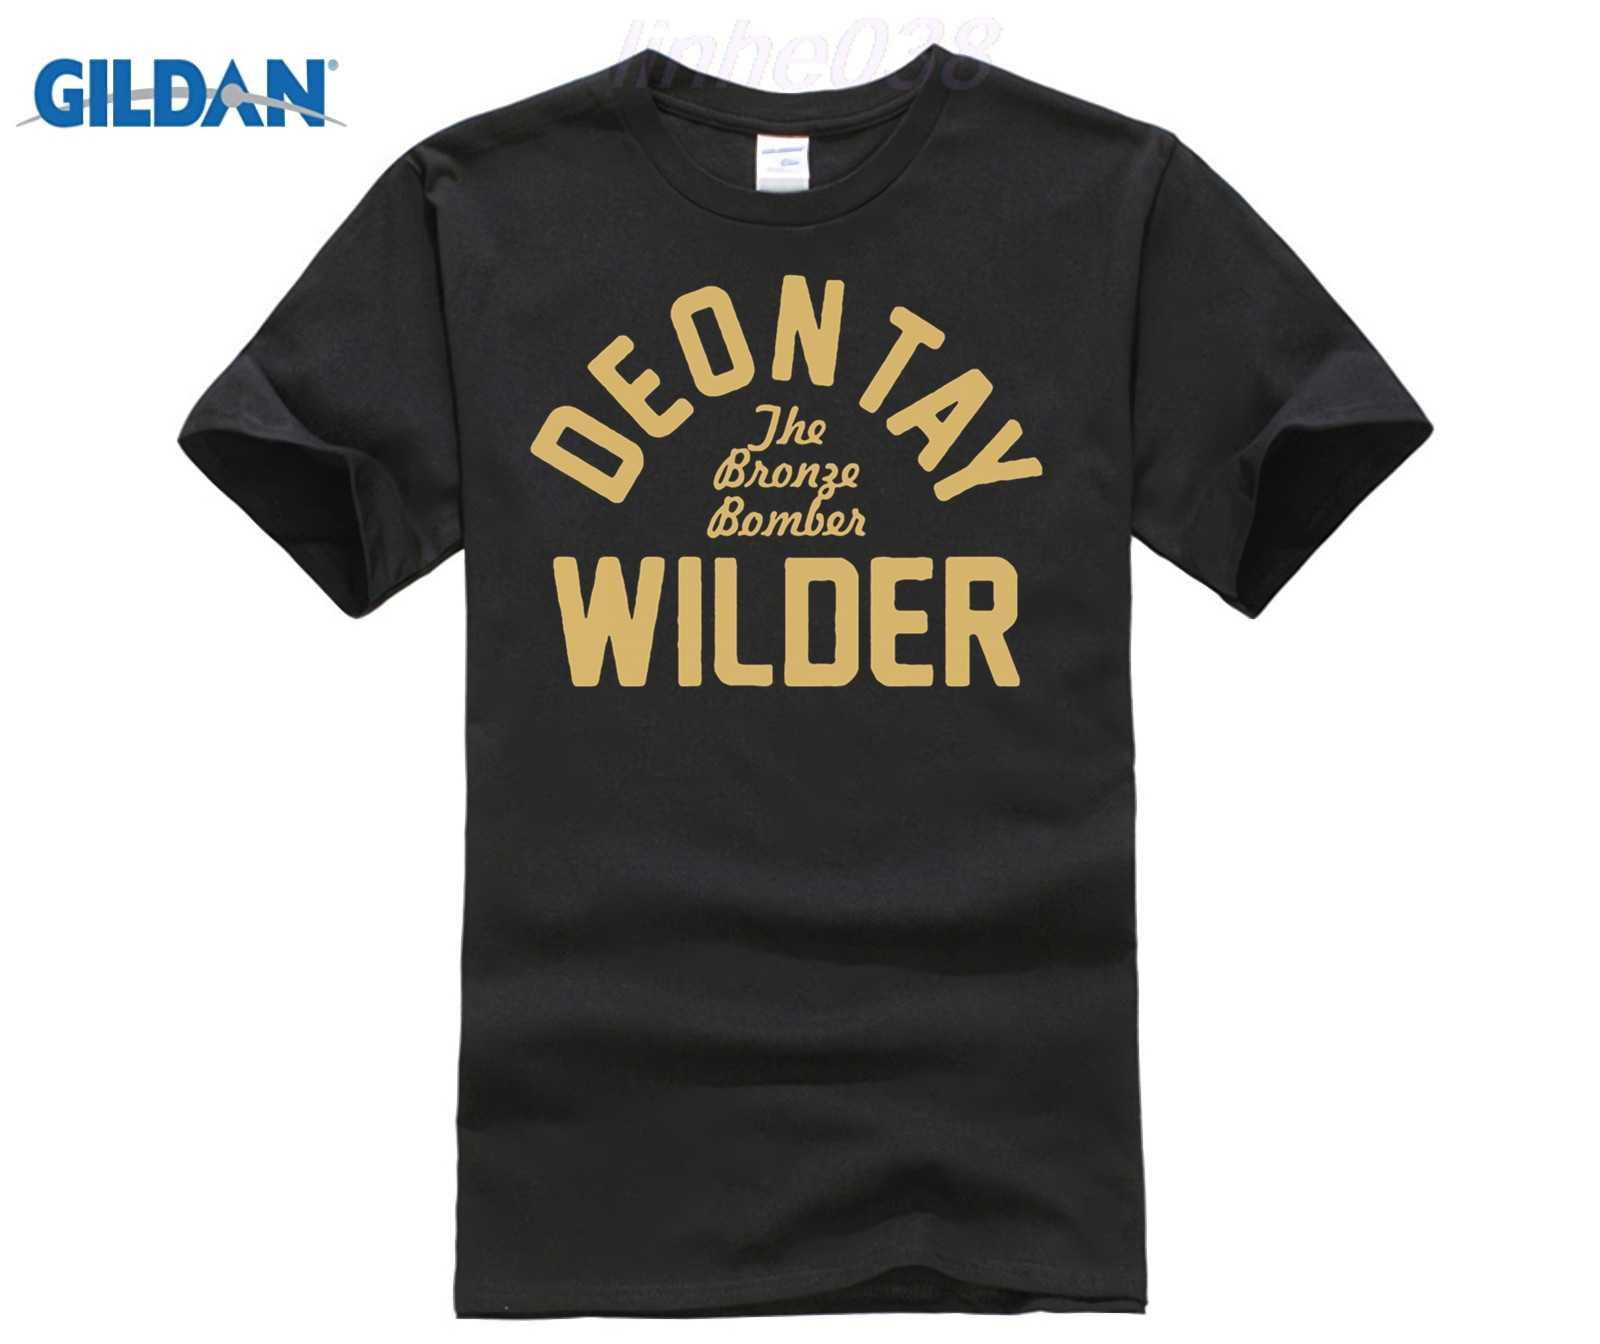 2b668e744368 Detail Feedback Questions about DEONTAY WILDER SHIRT Summer Mens T ...